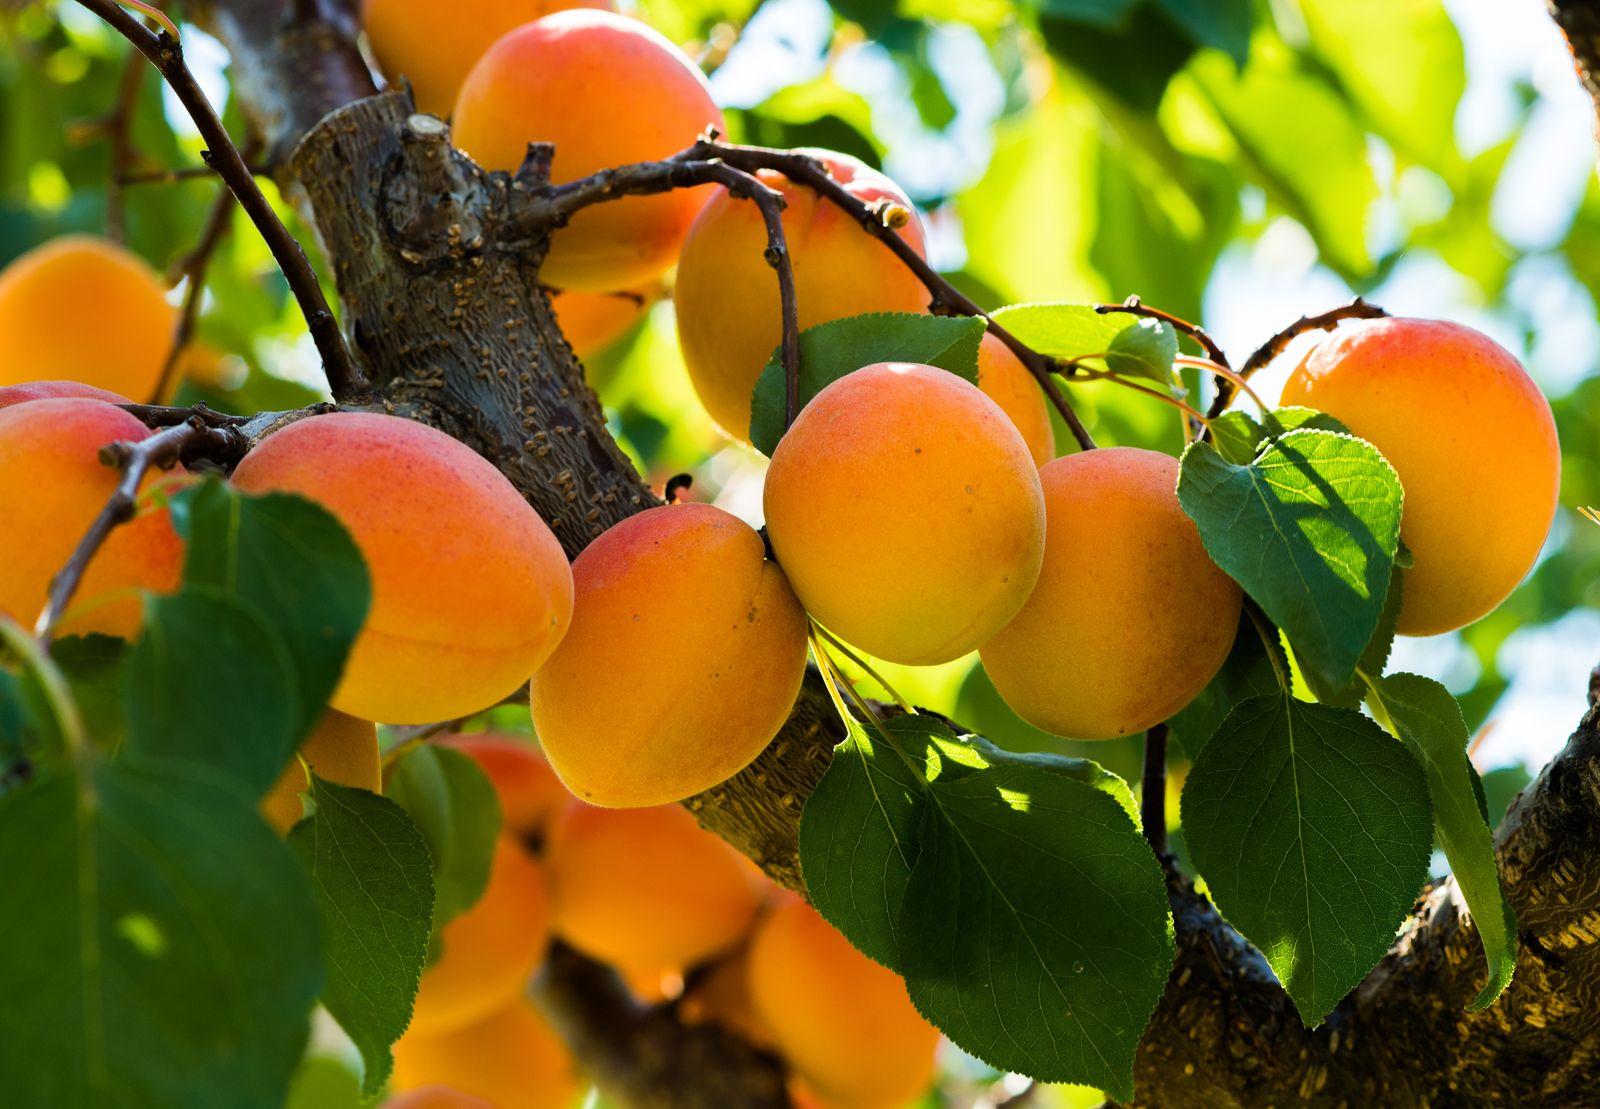 Aprikosenbaum Pflanzen Anleitung Tipps Vom Profi Plantura